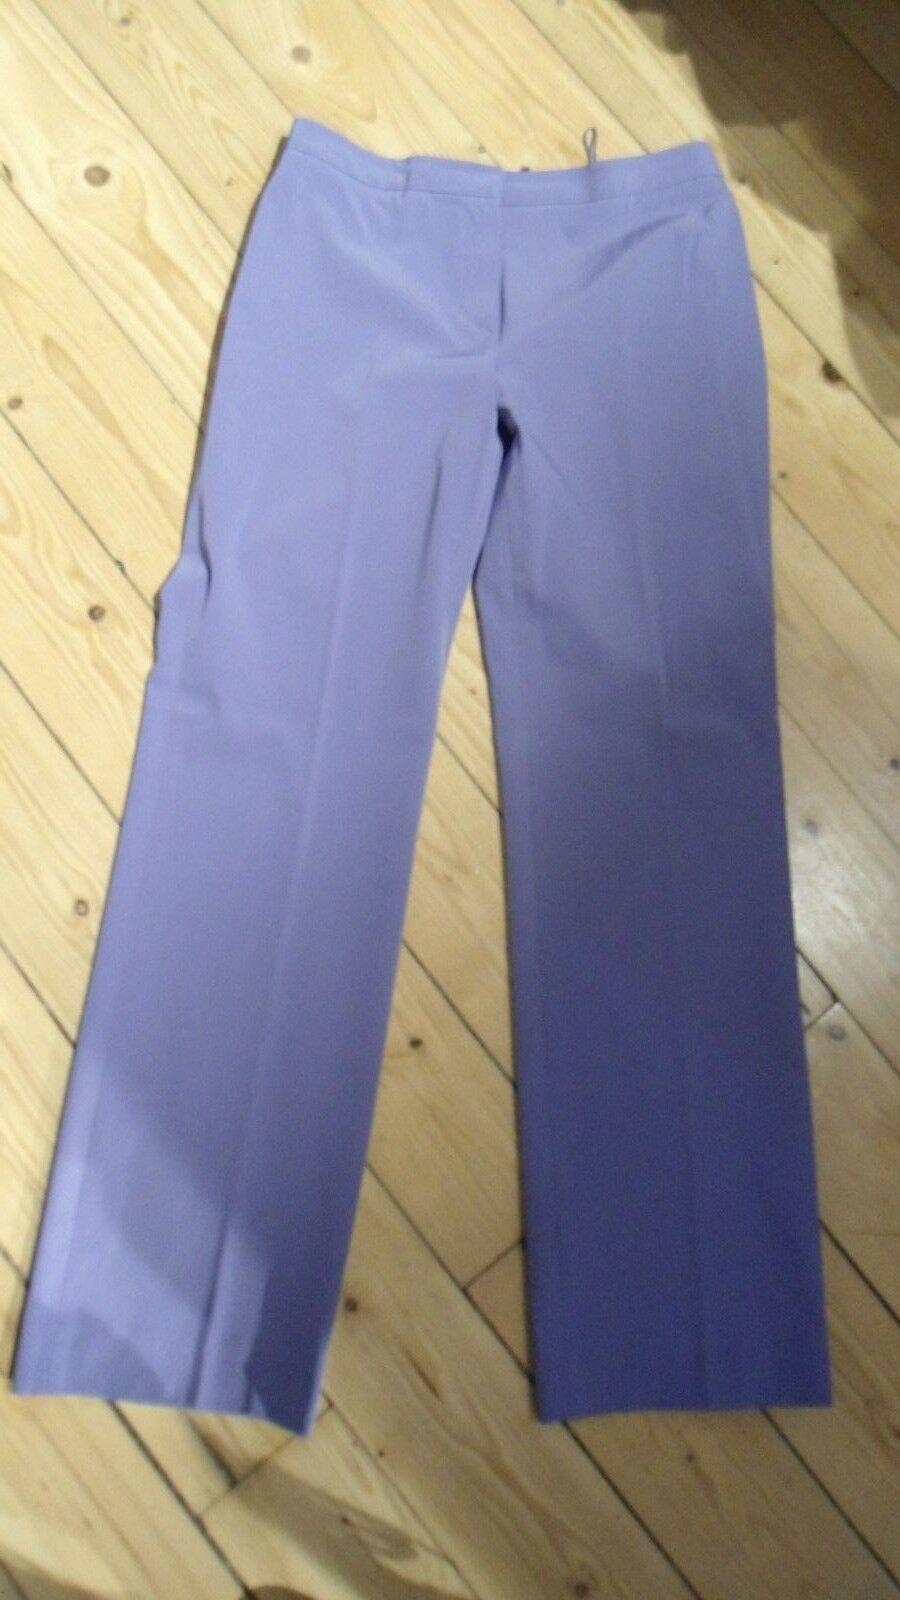 ORIGINALE Lusso Designer Pantaloni STRENESSE Gabriele Strehle MIS. 42 come nuovo